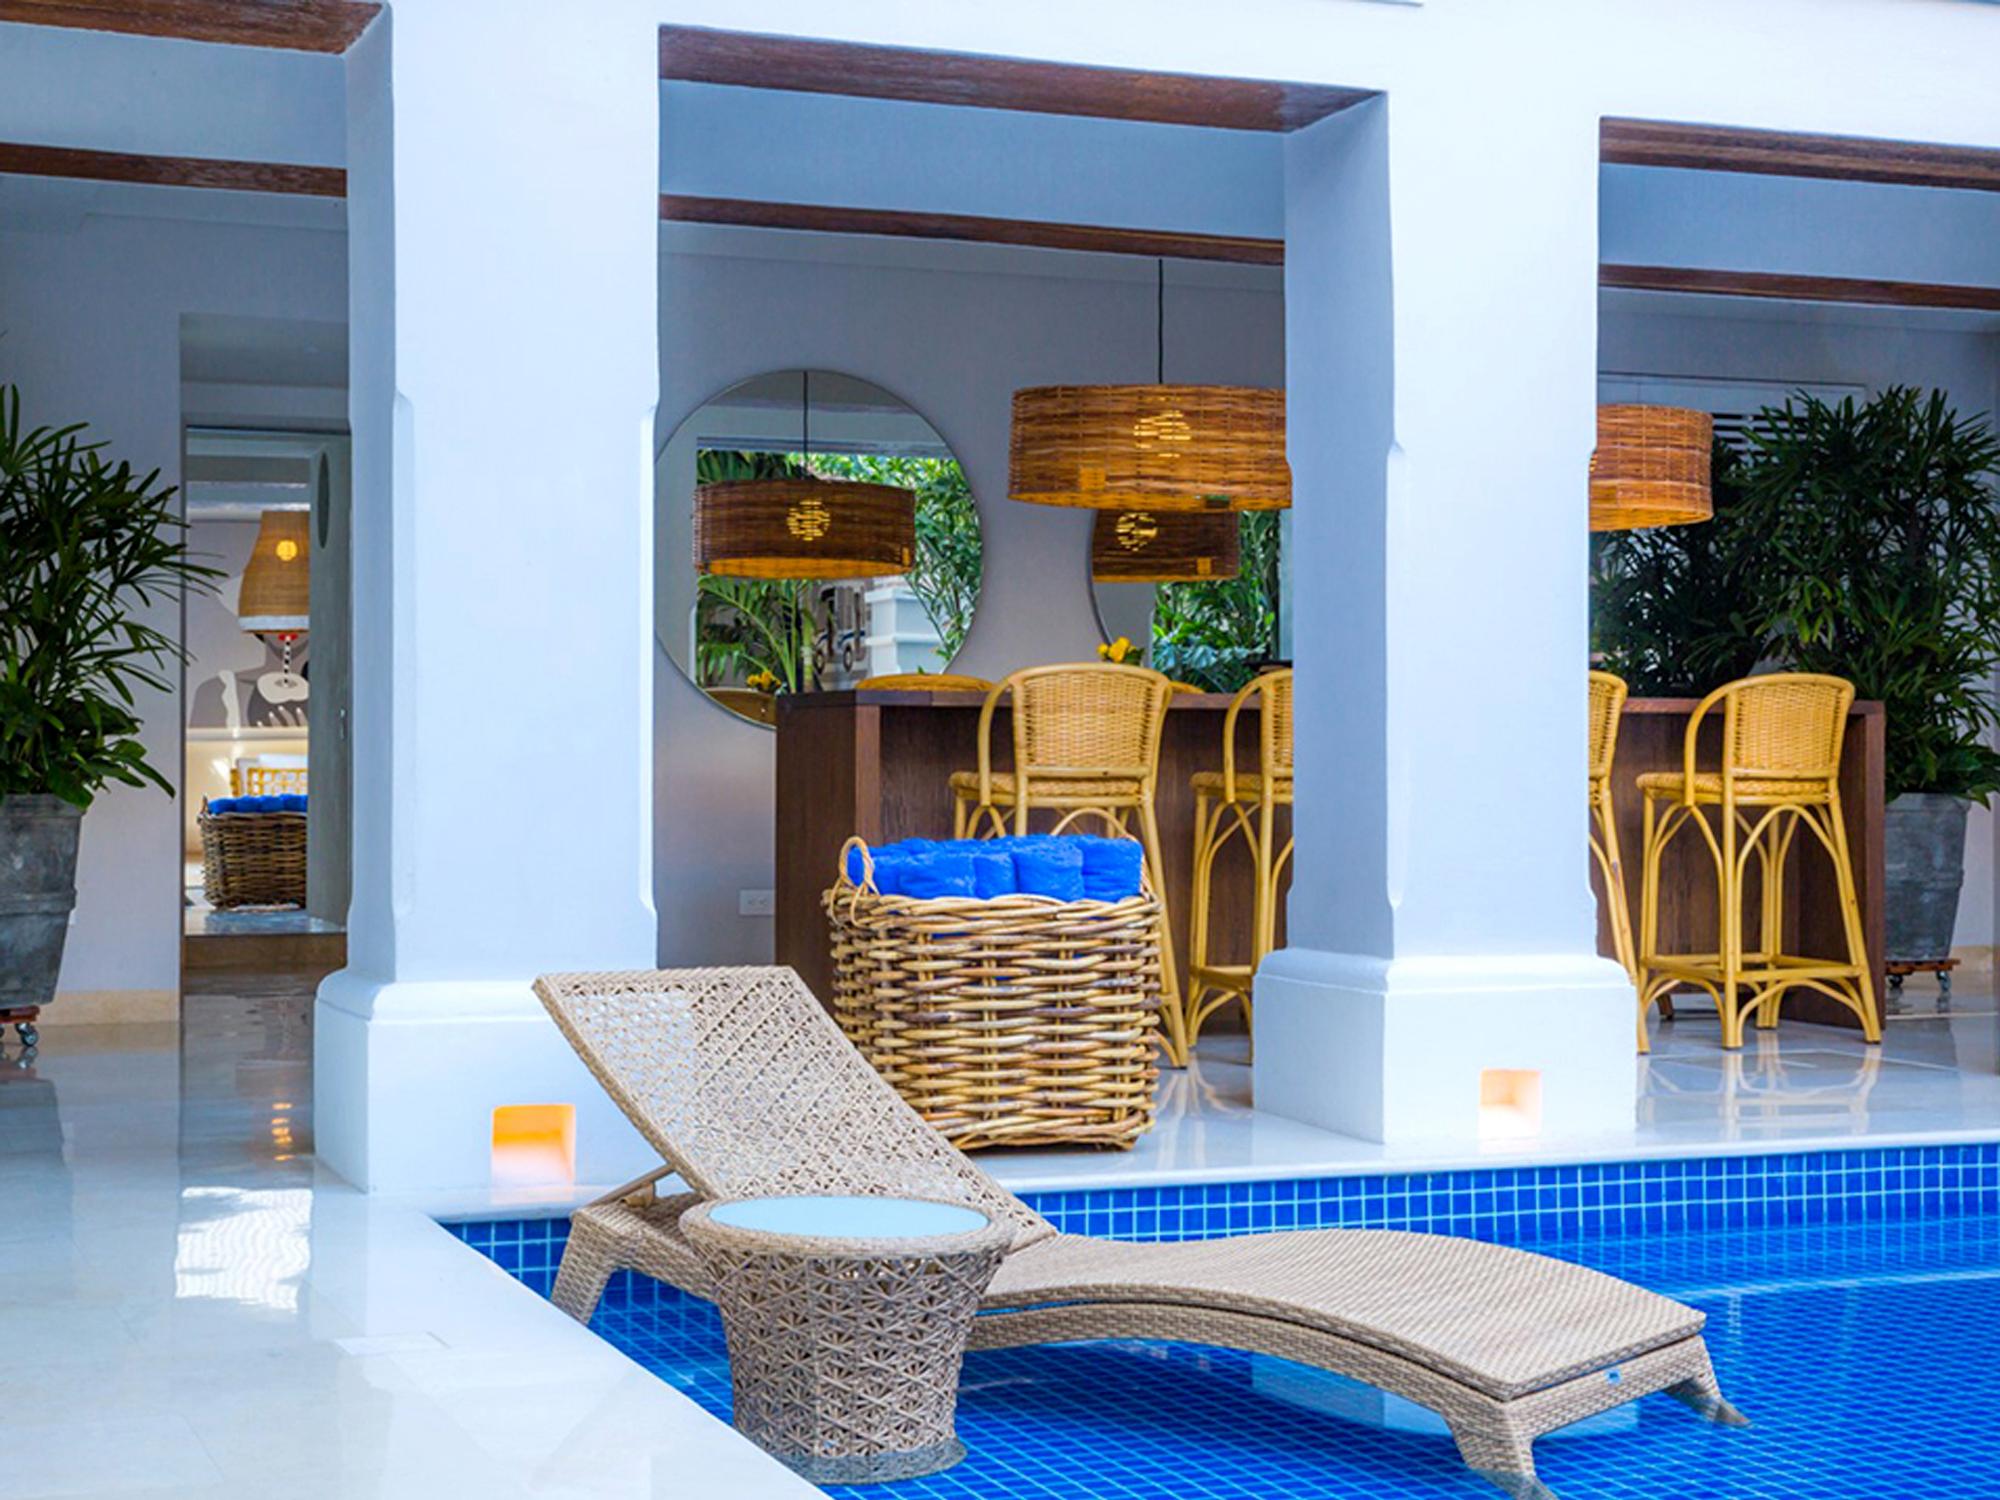 HOTEL CASA LA MERCED 12